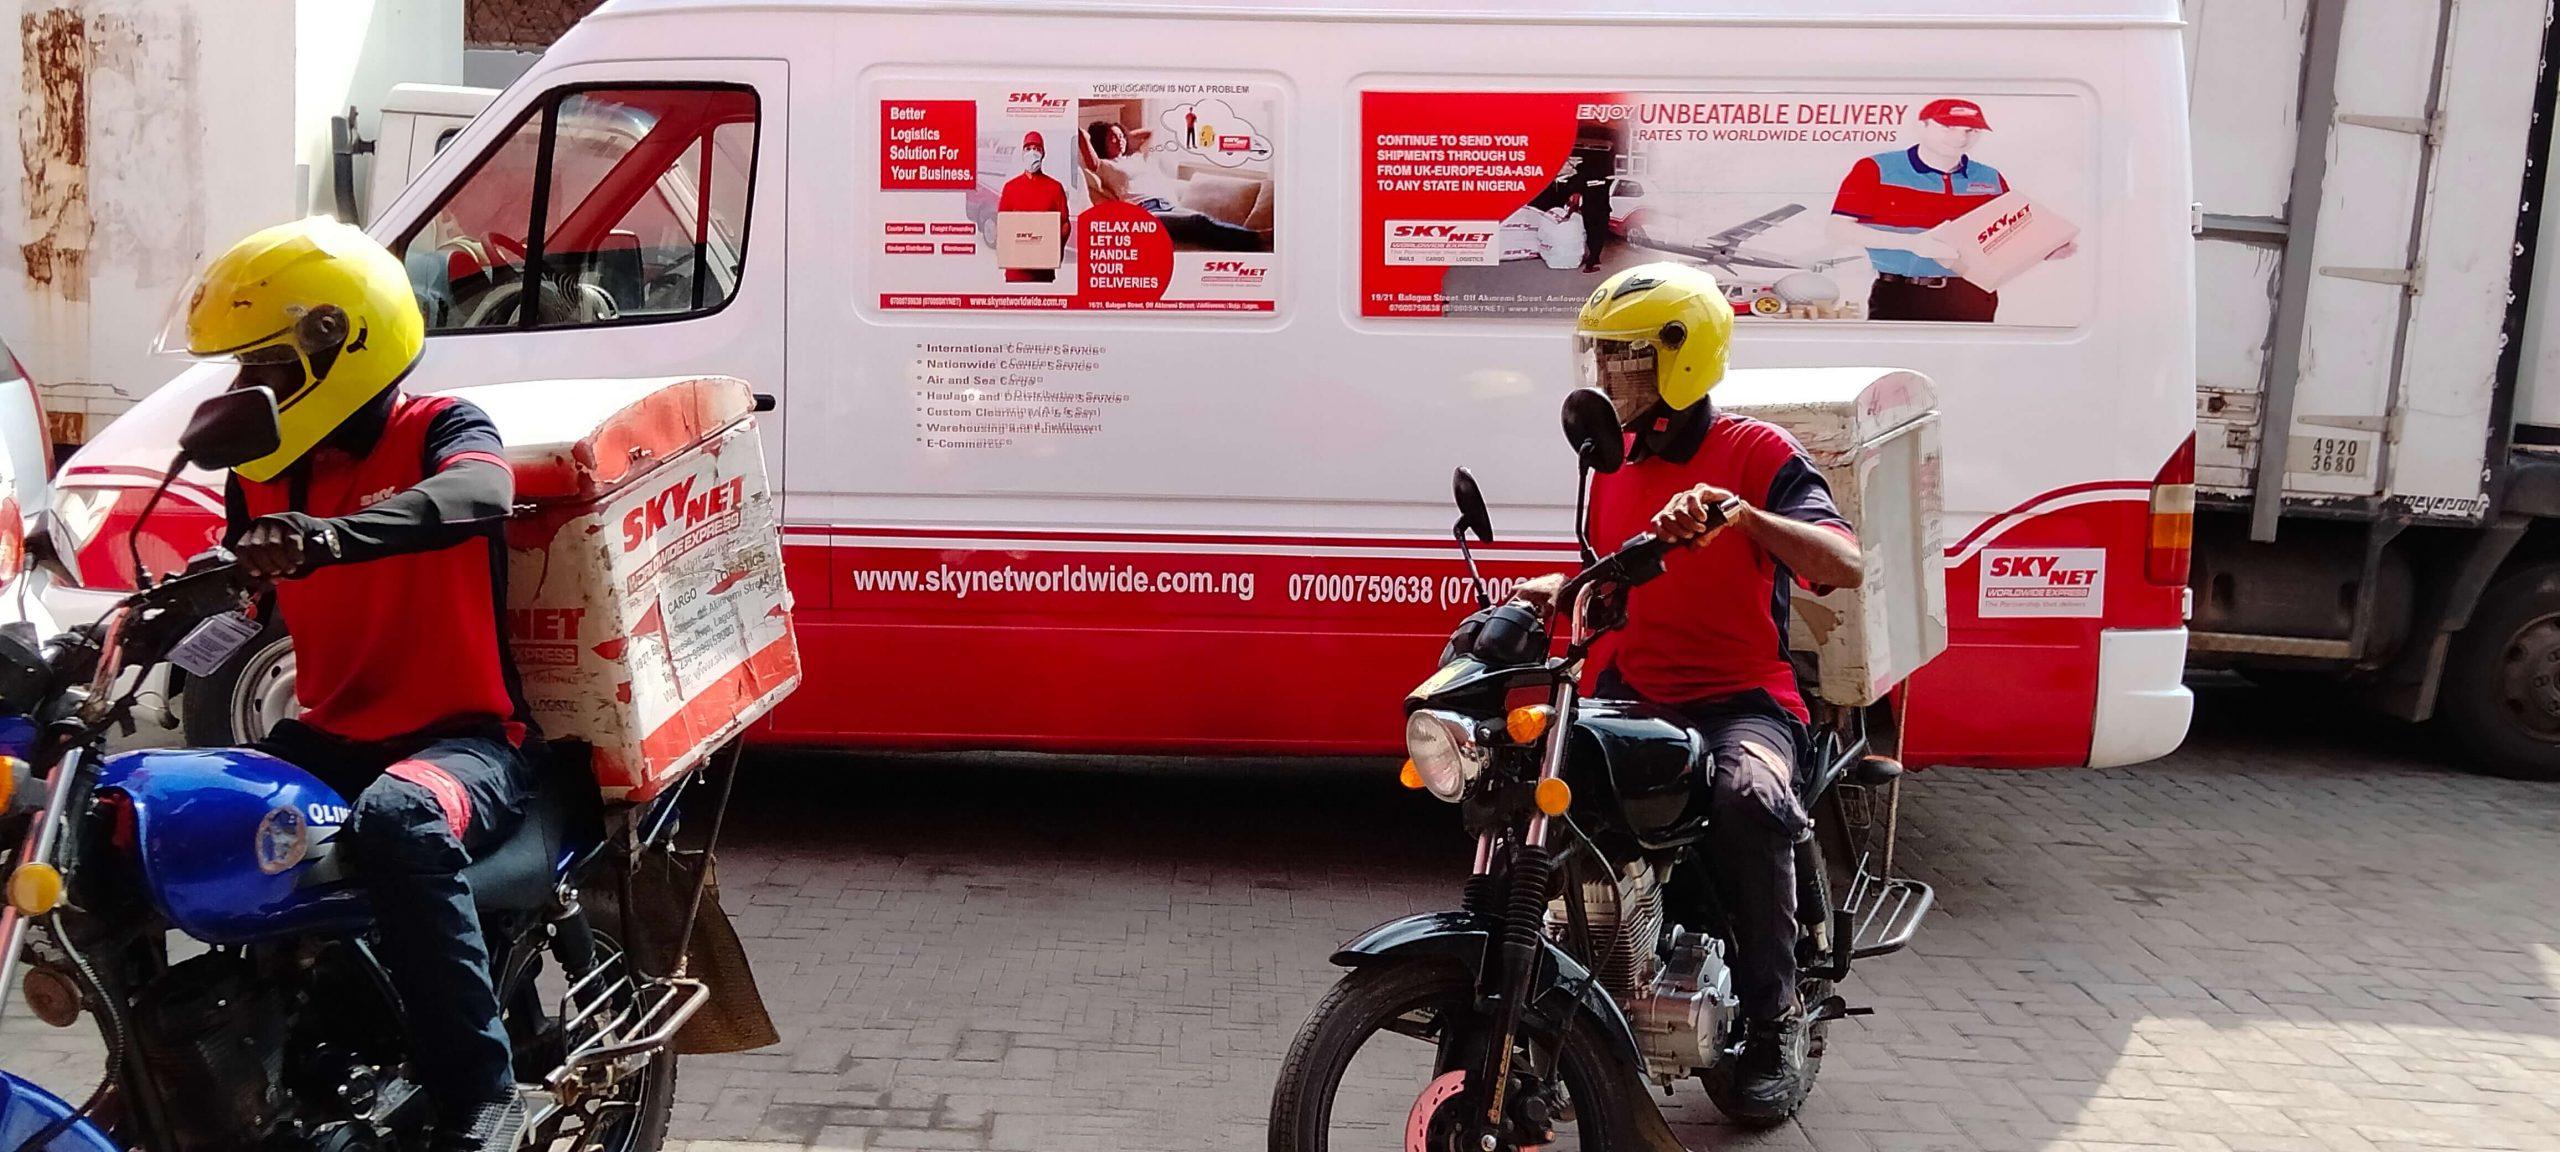 logistics company in Lagos - SkyNet